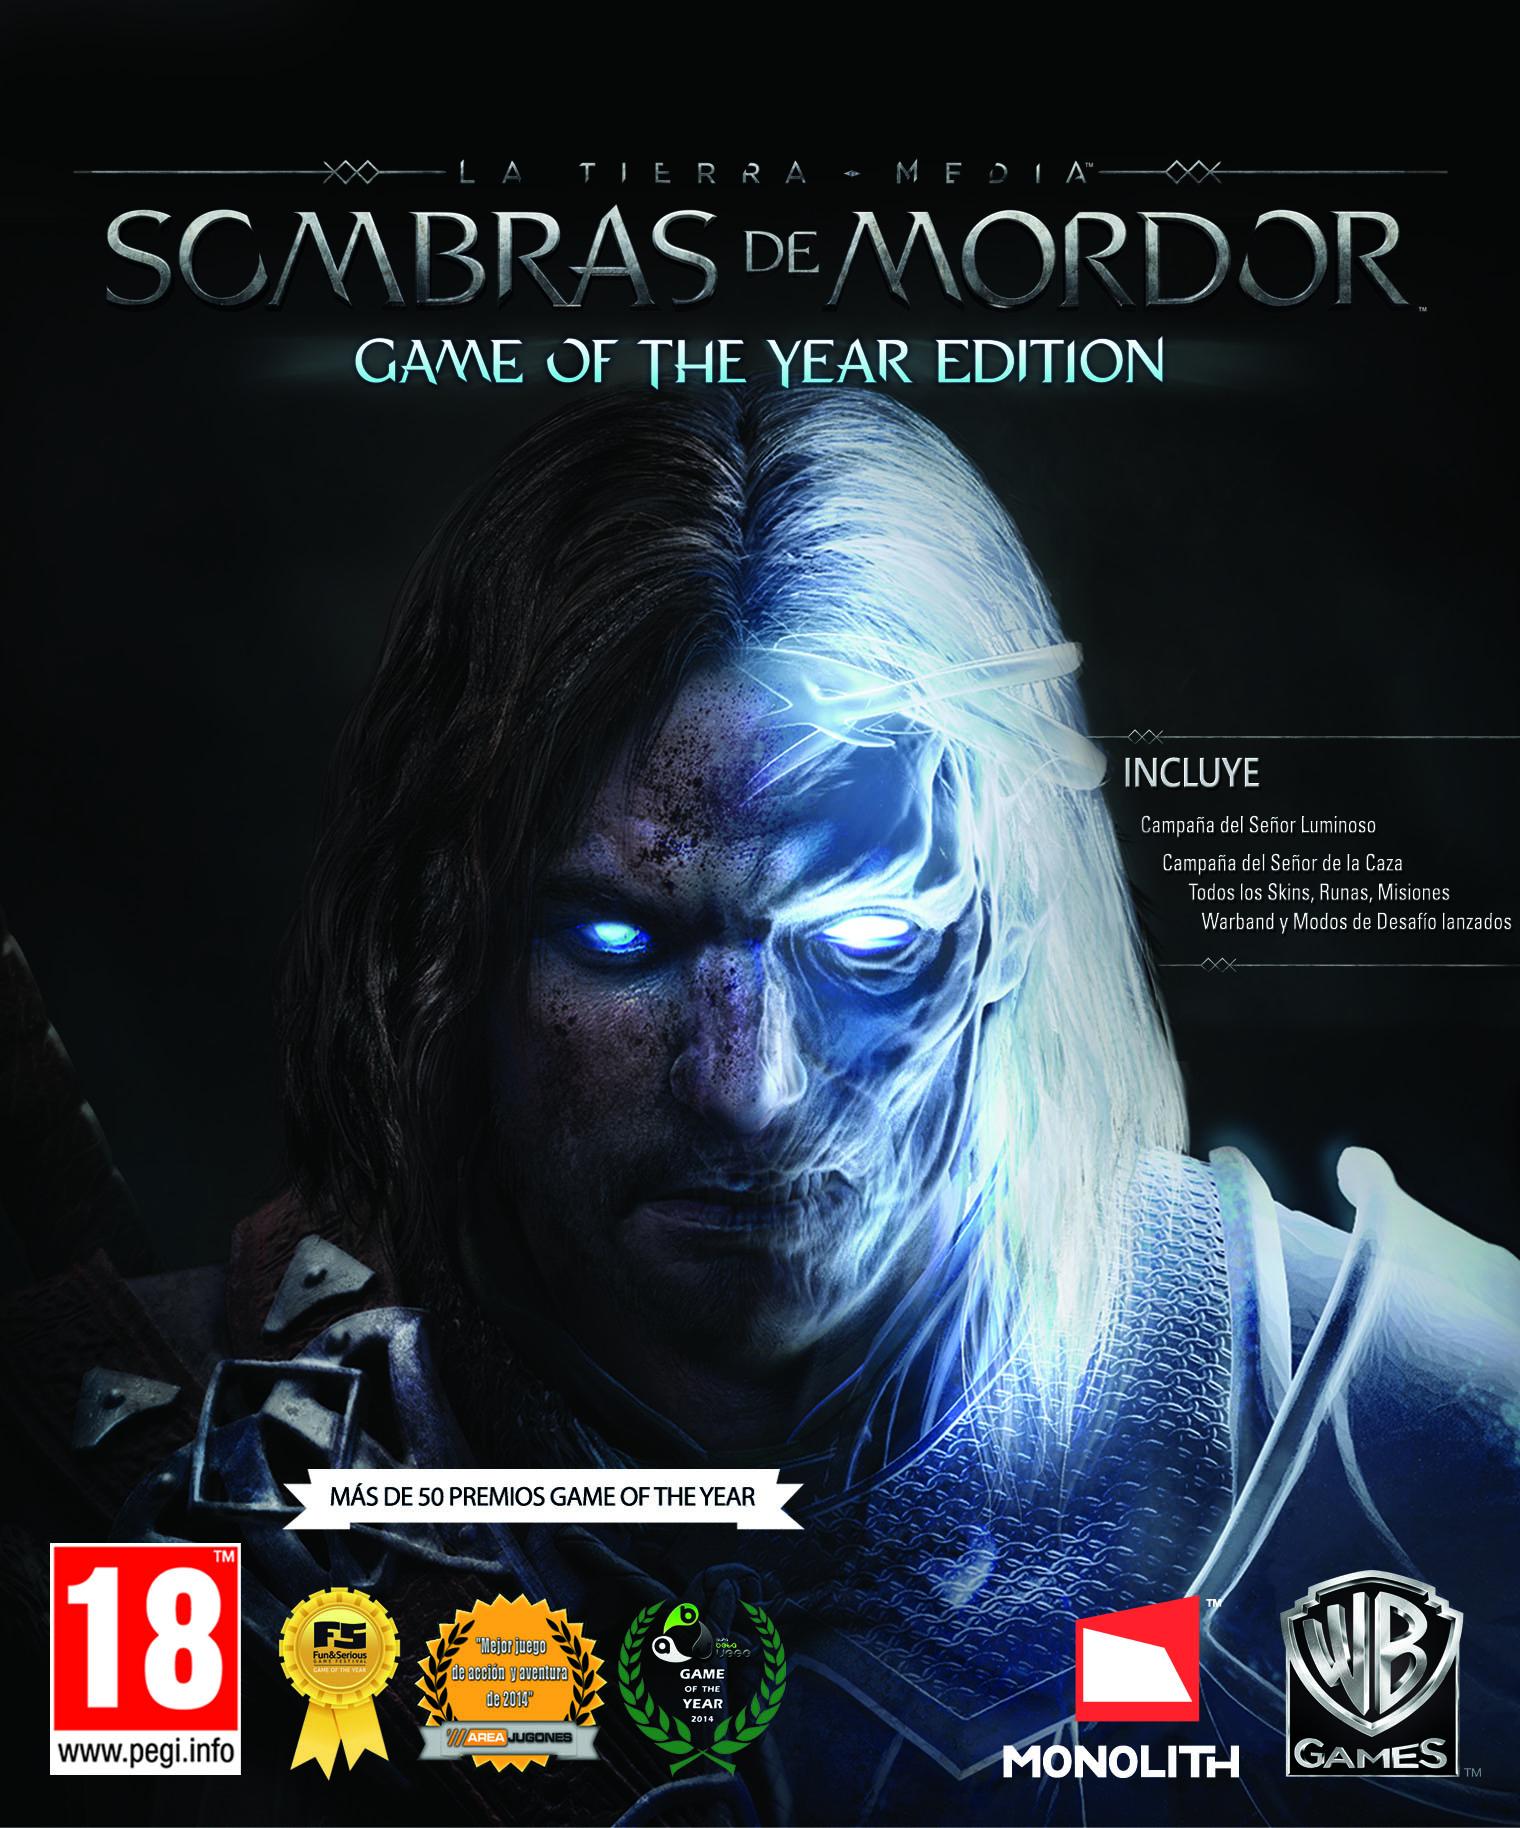 Sombras de Mordor GOTY